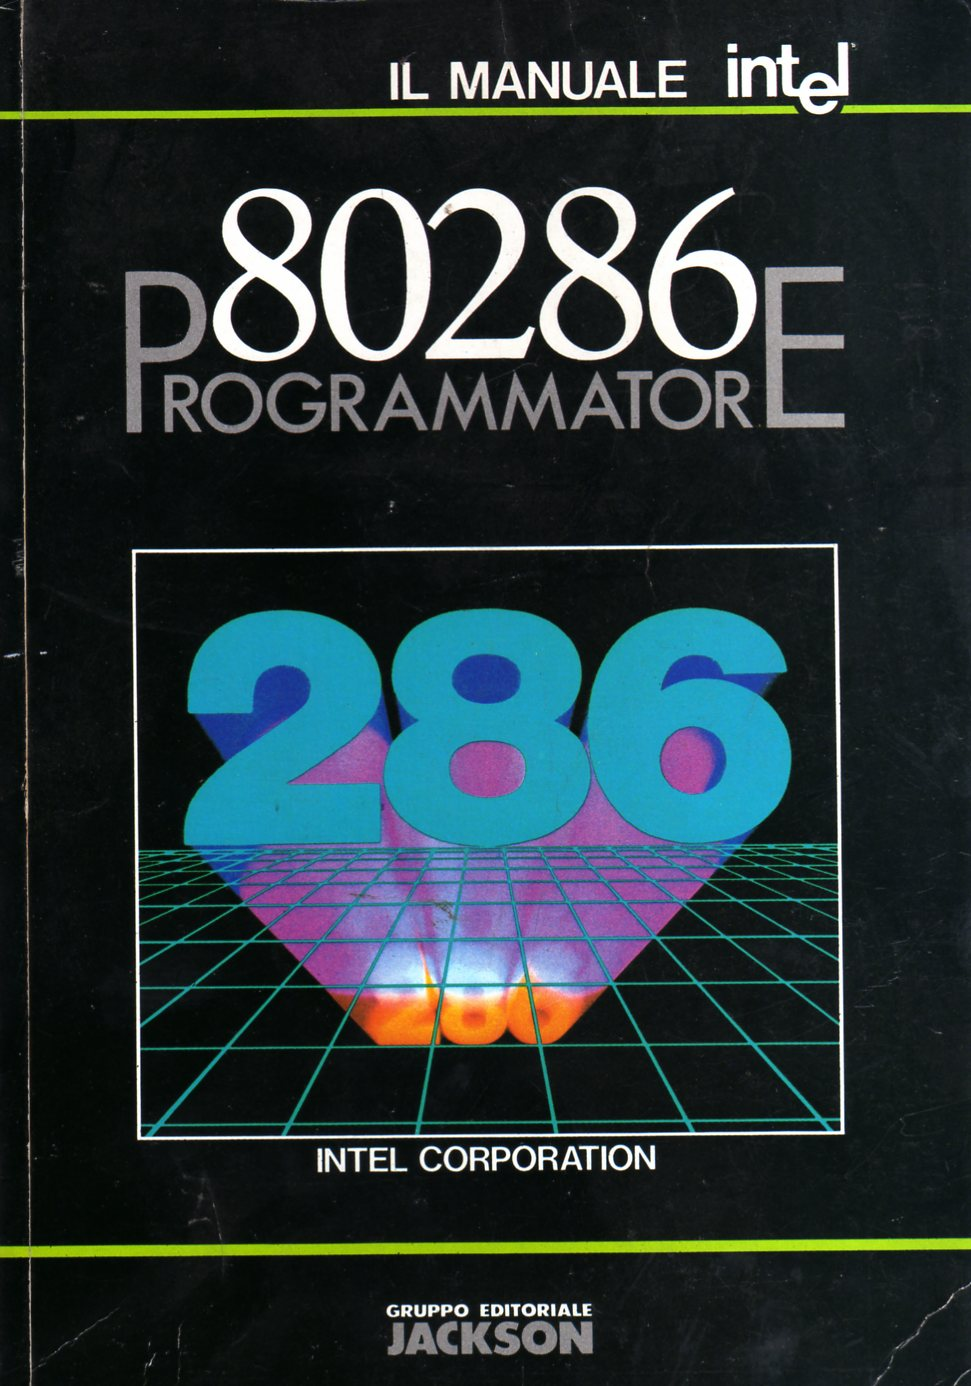 80286 programmatore